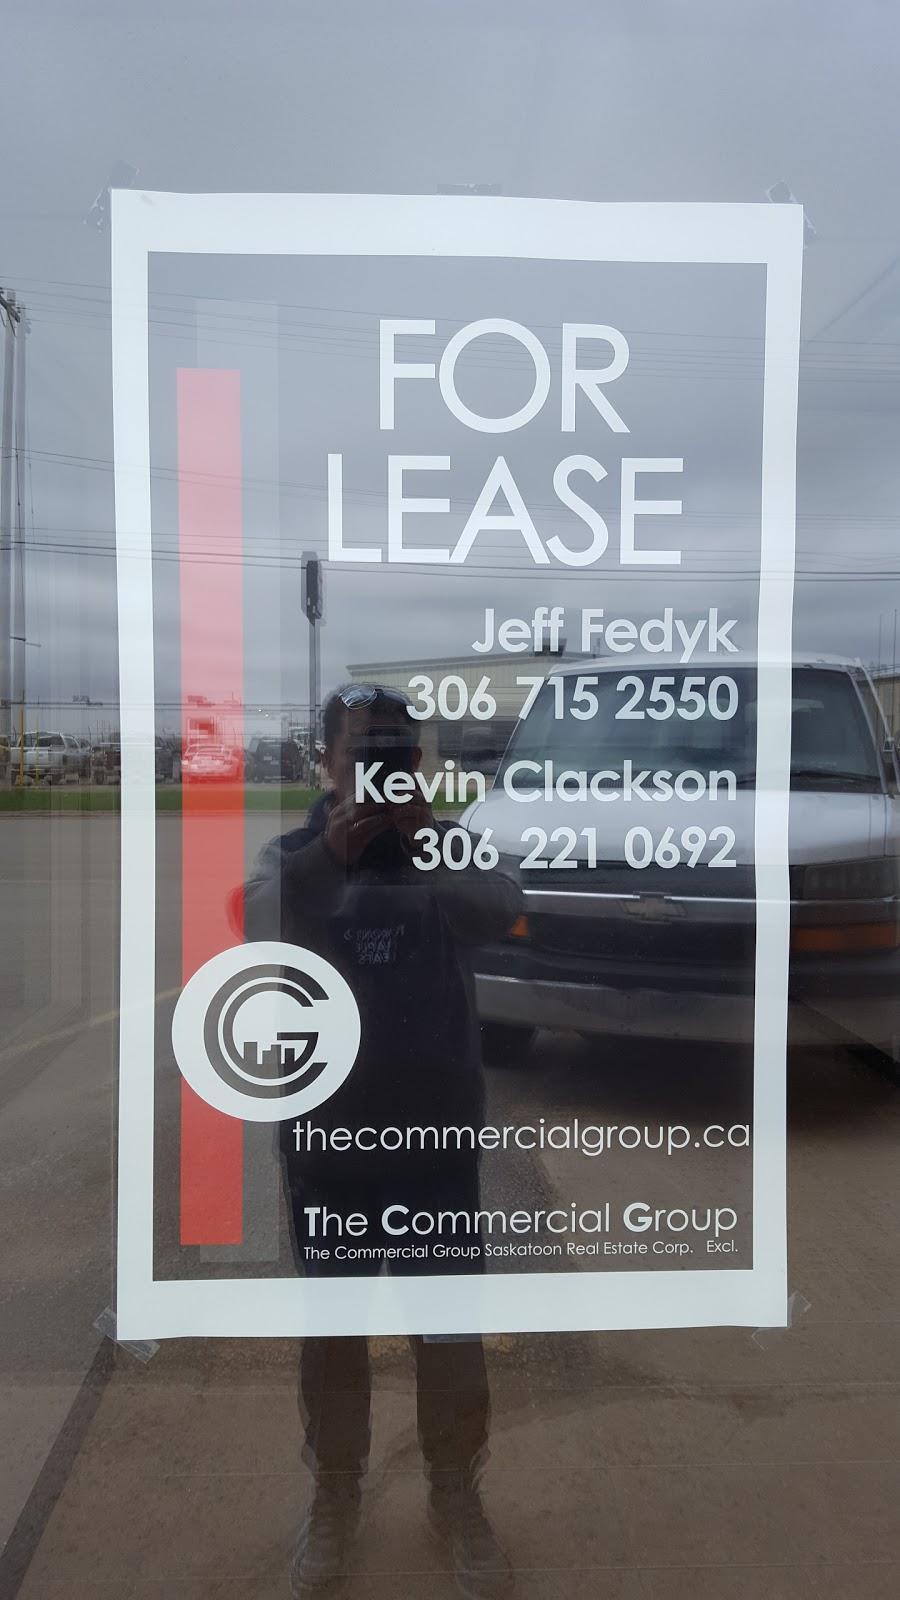 Bridge City Glass | car repair | 7 825 45th St E, Saskatoon, SK S7K 3V3, Canada | 3066644616 OR +1 306-664-4616